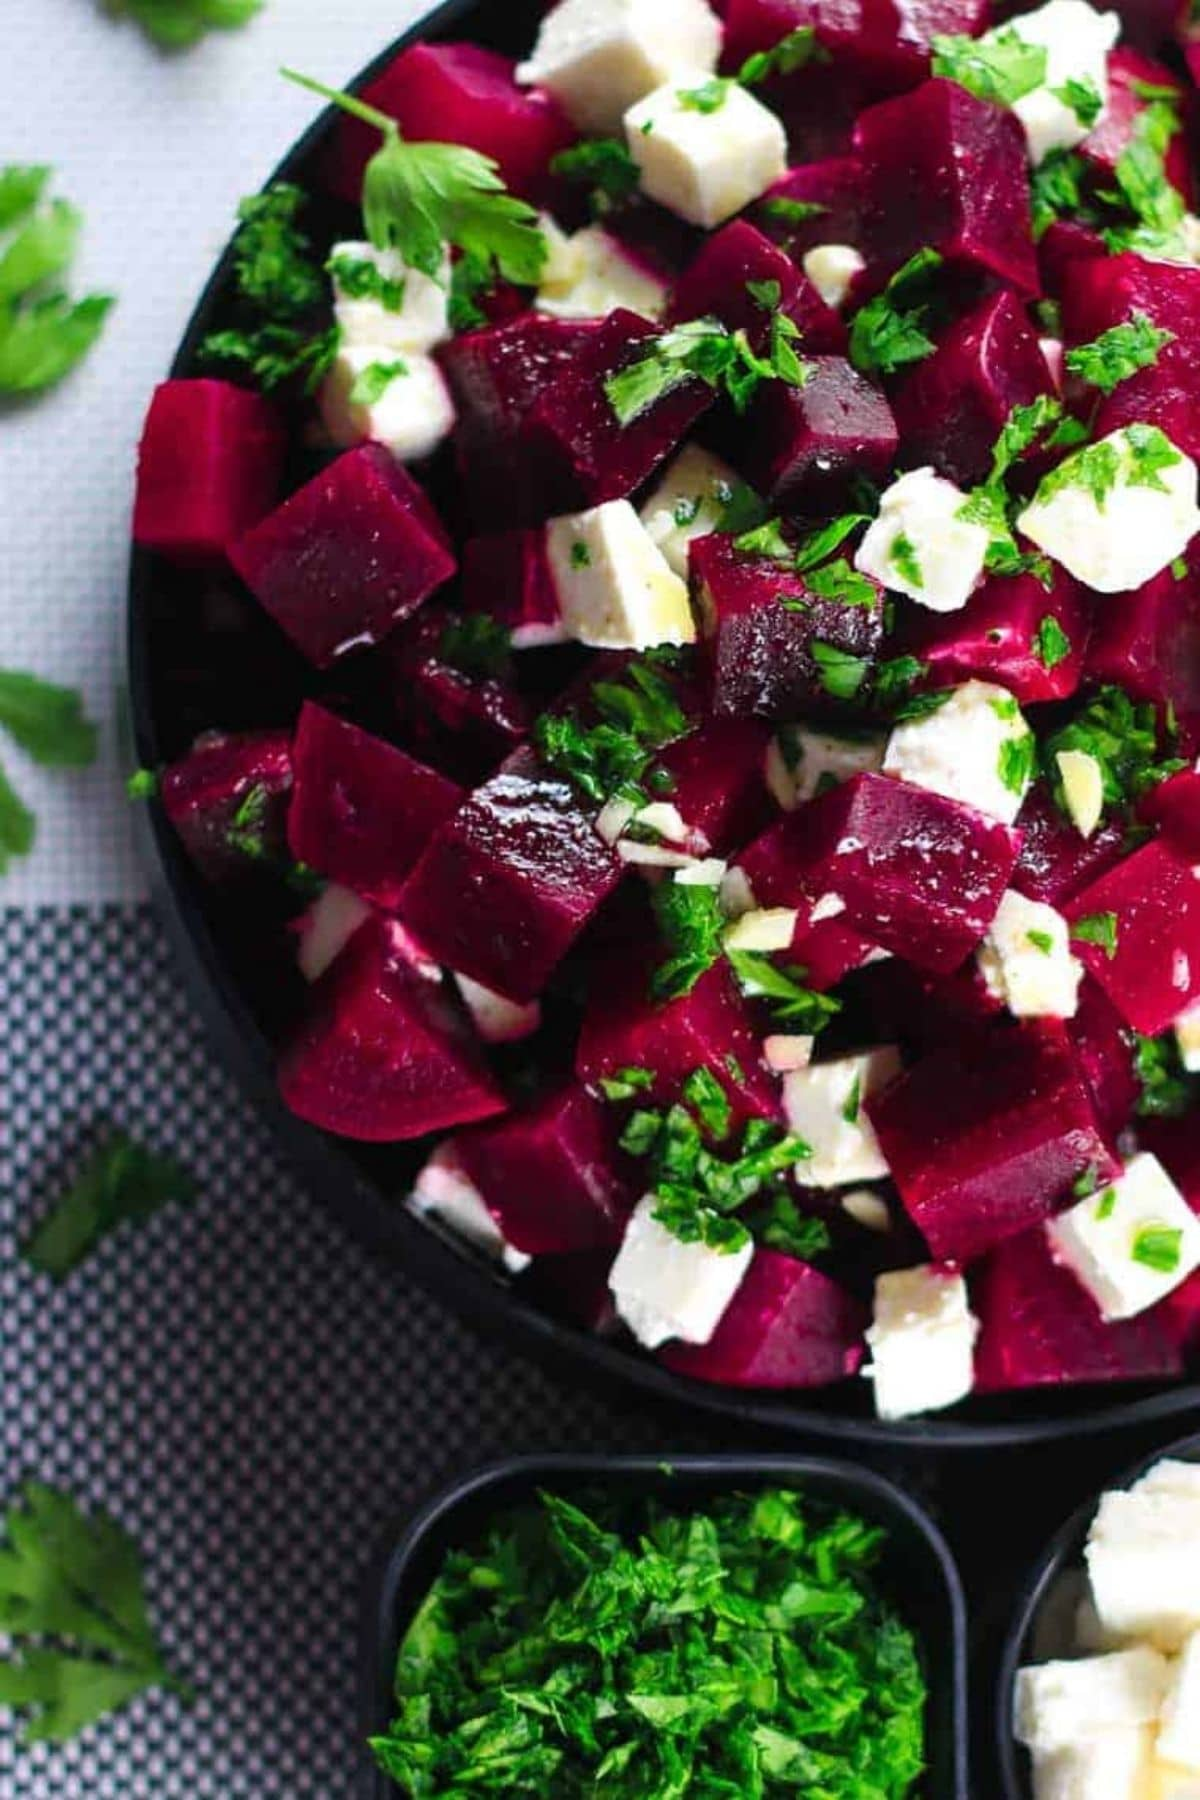 Beet salad in bowl